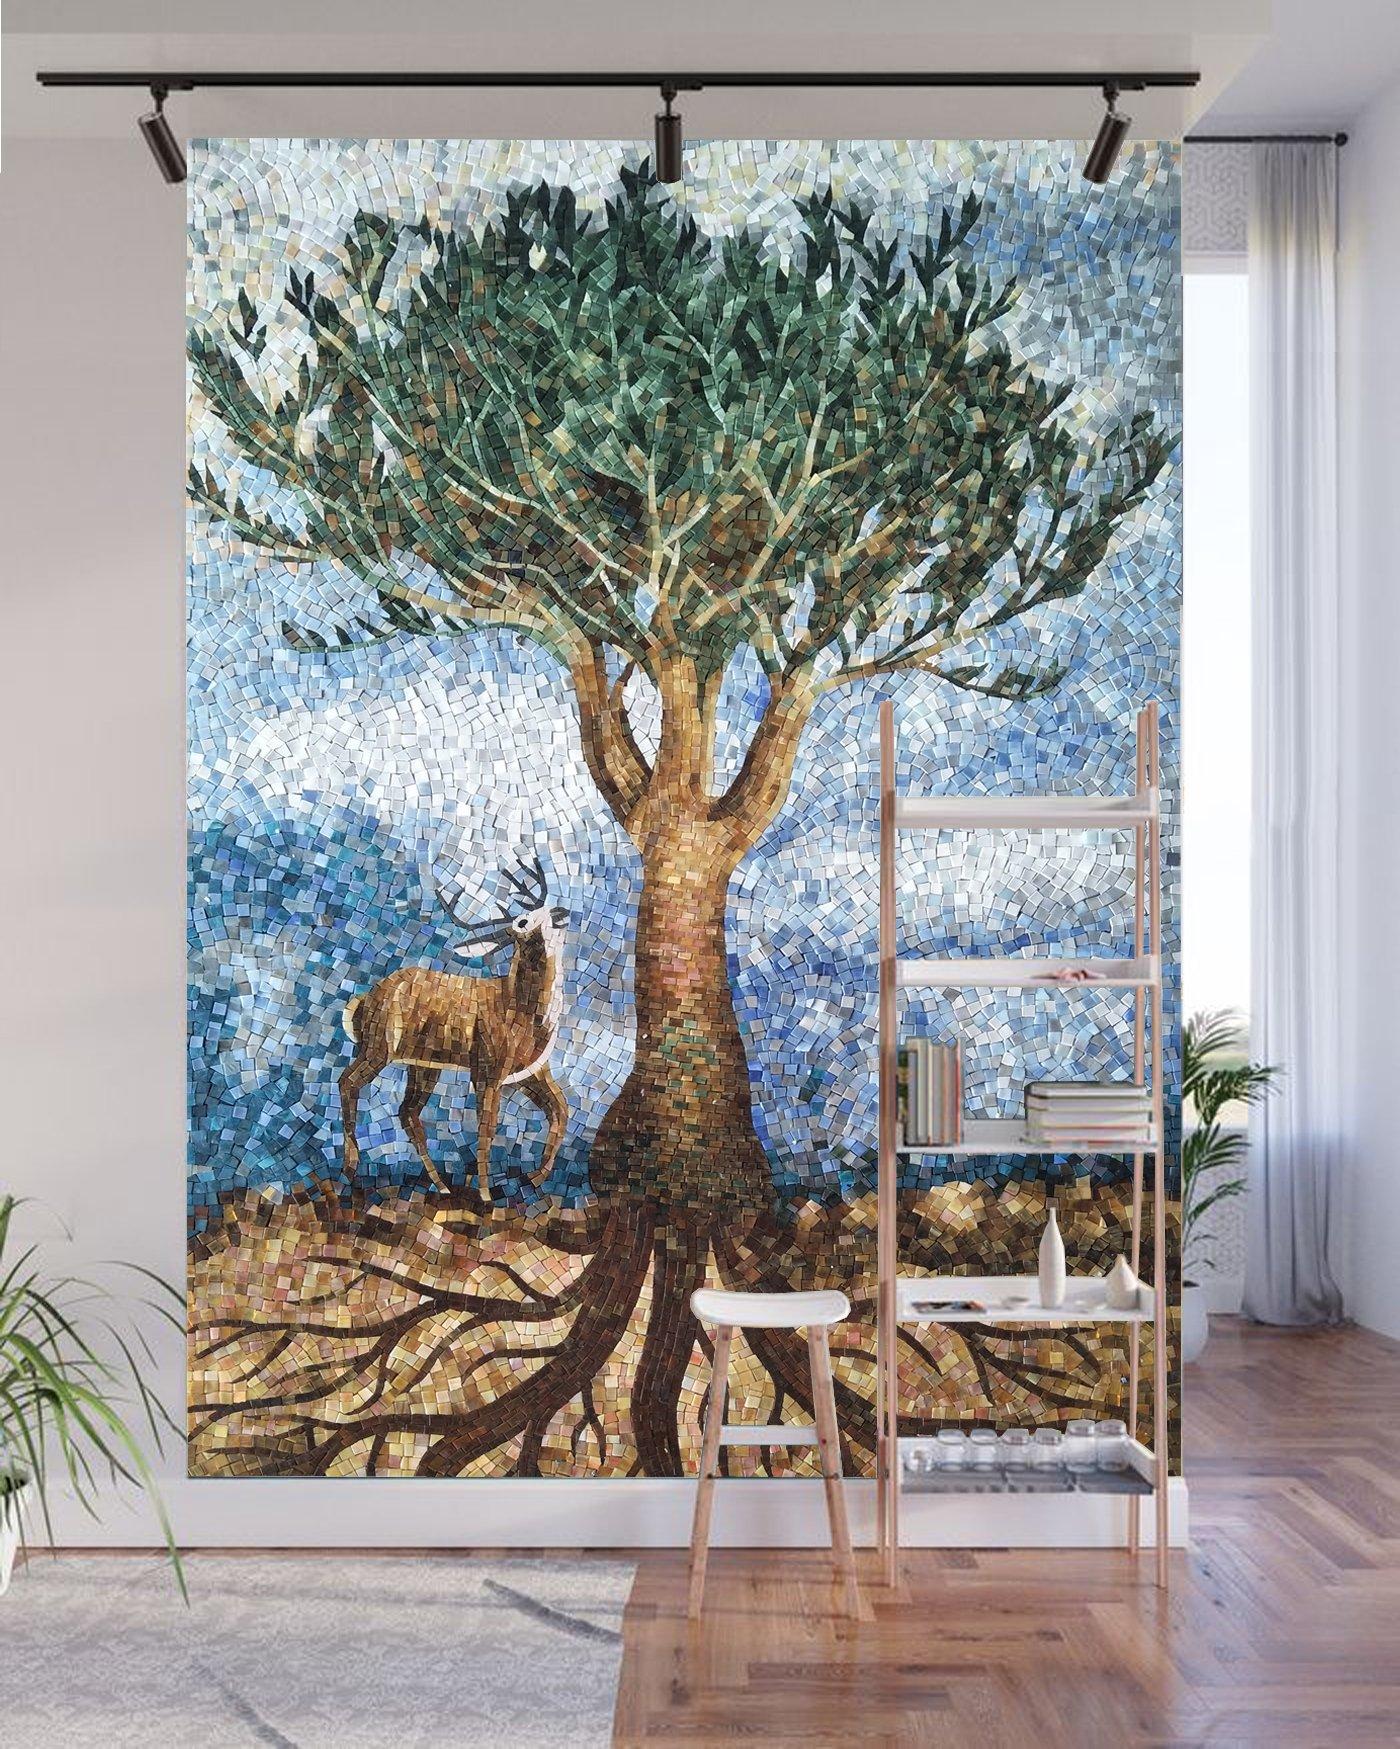 Handmade Mosaic Design Mural by Mosaics Lab